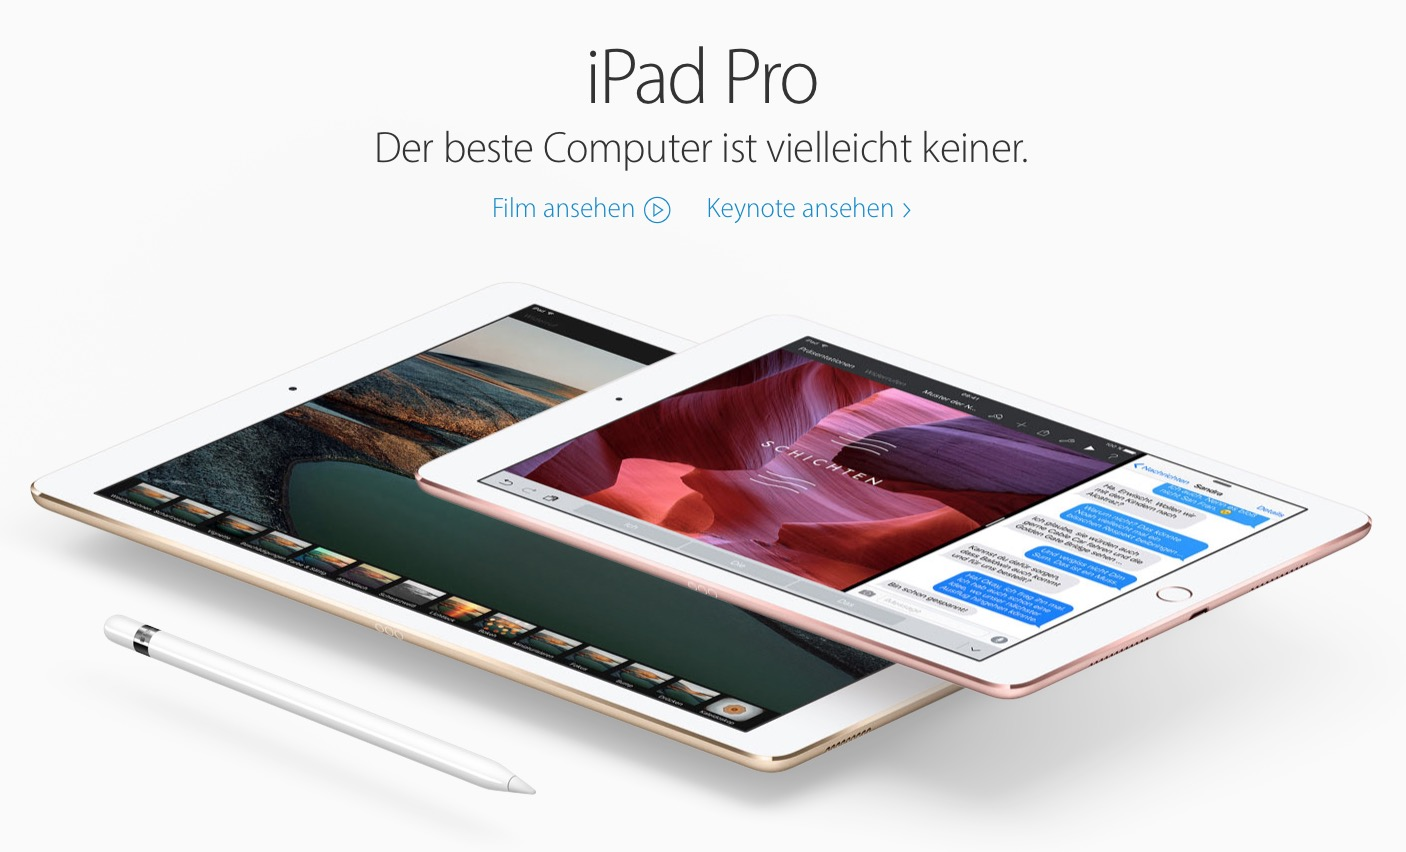 iPad-Pro-PC